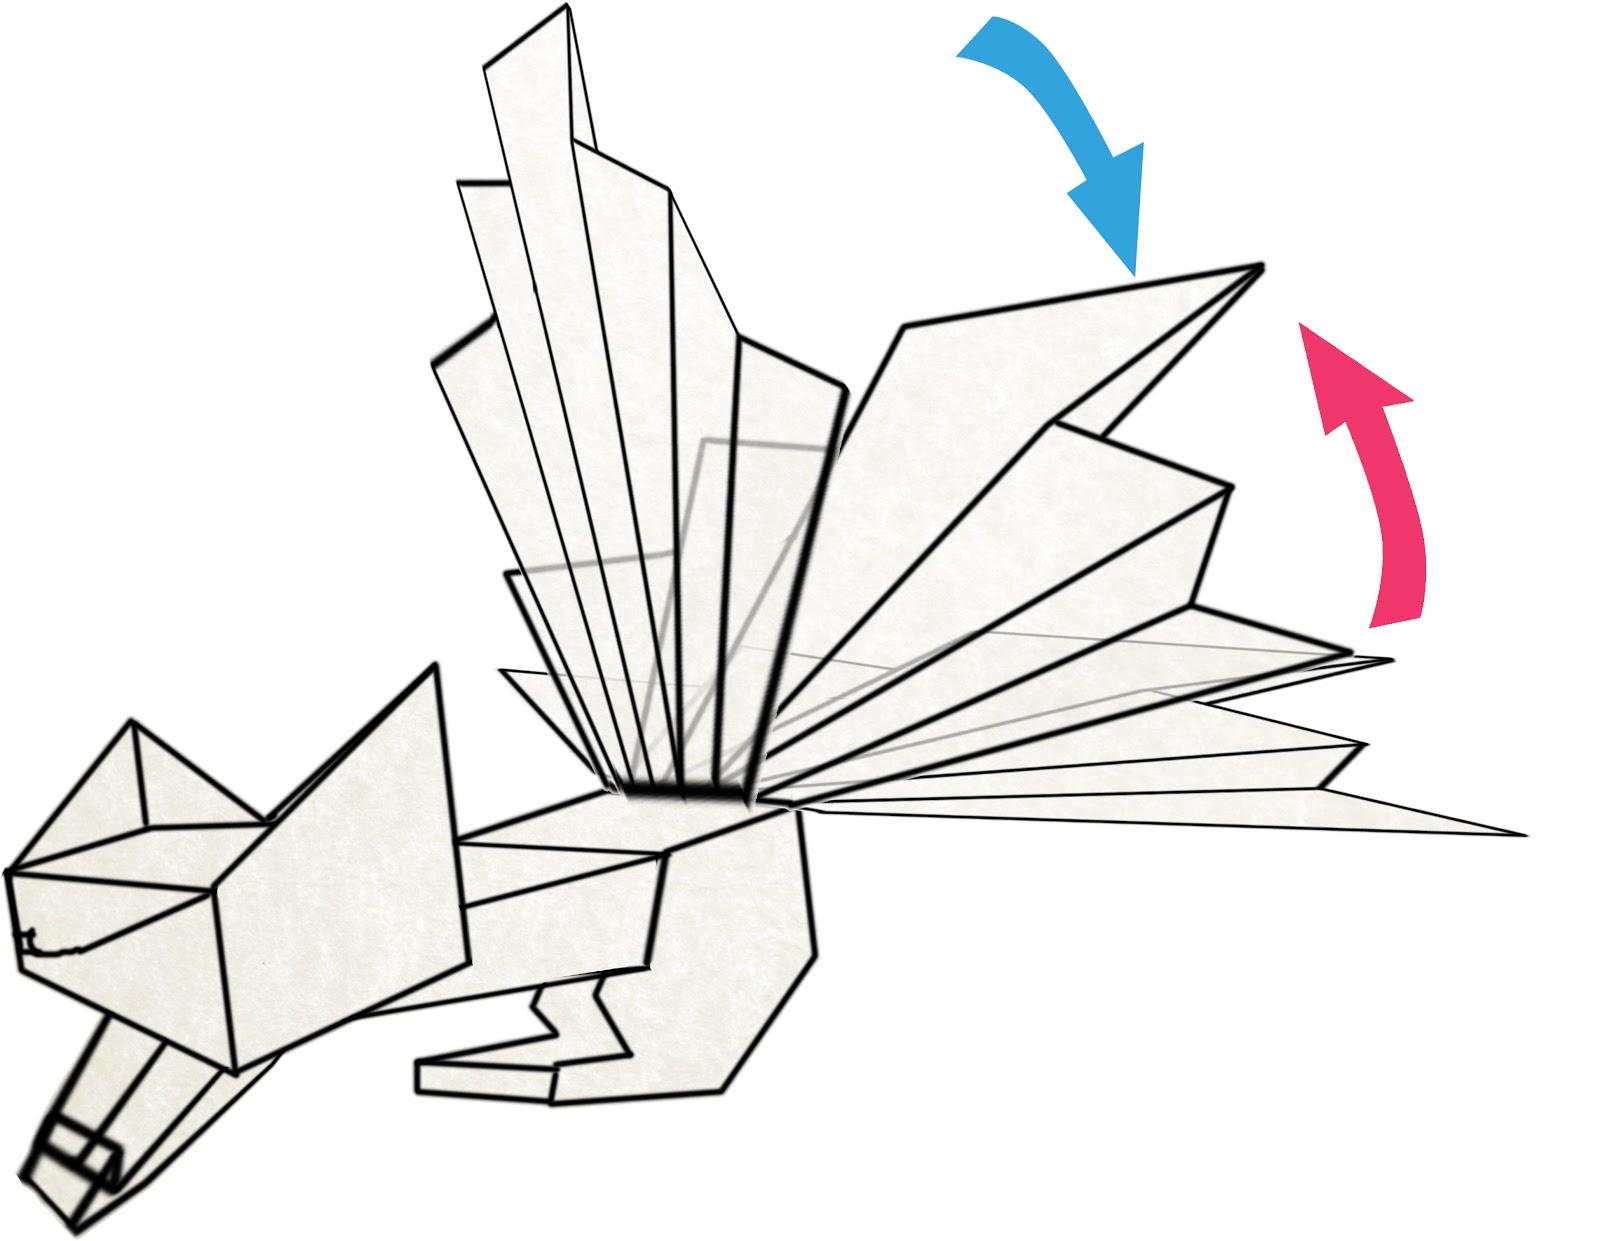 Xiaofeng @ Victoria University School of Design Blog: May 2013